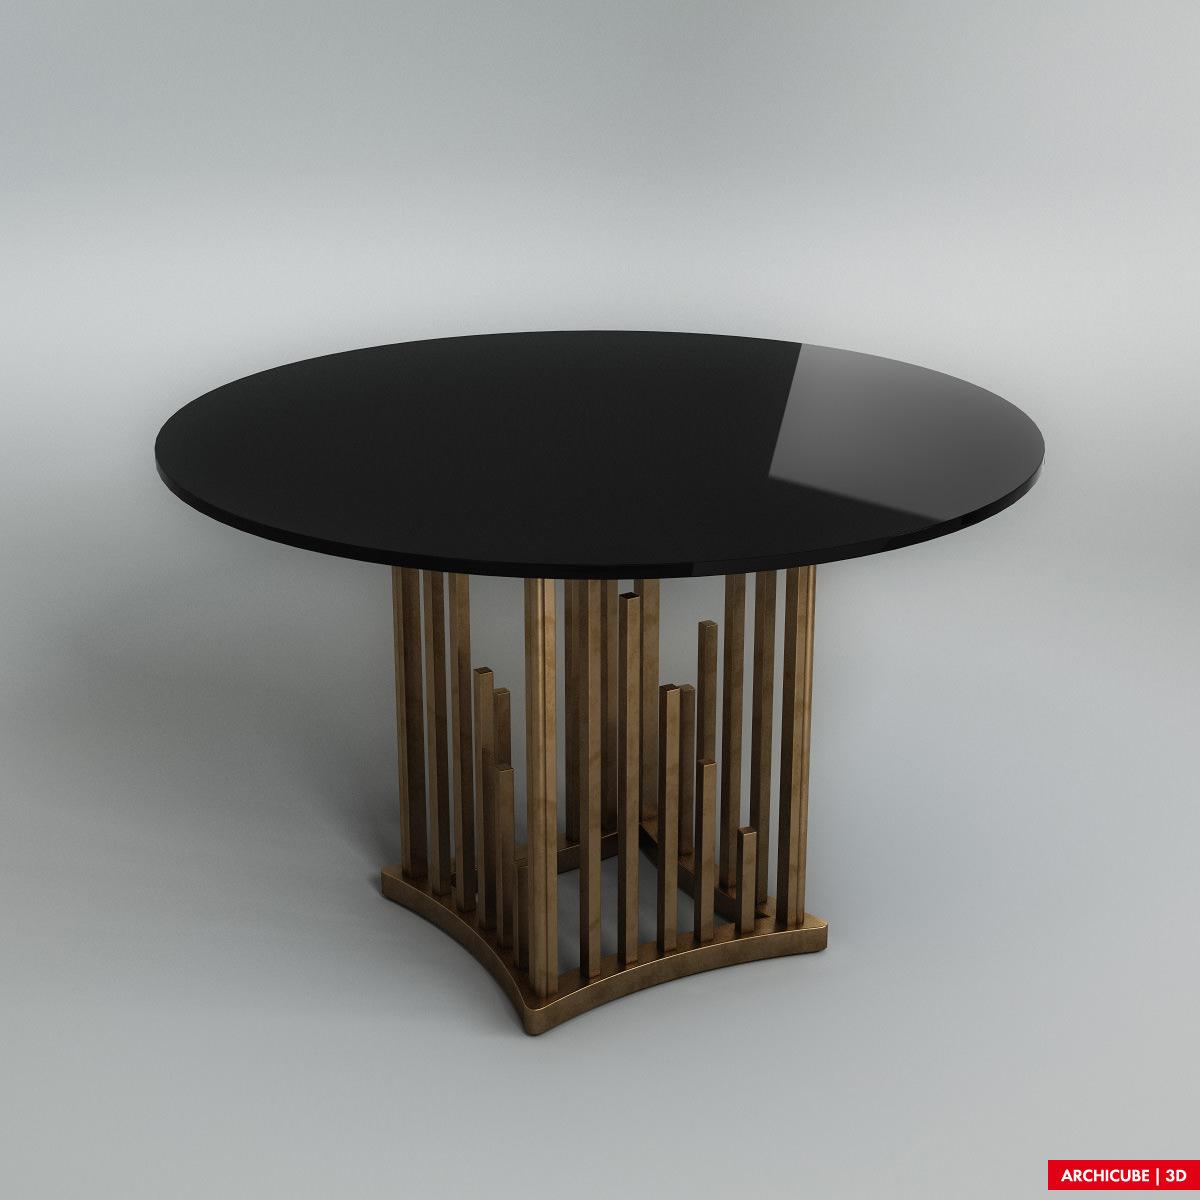 Dining Table 3D Model max obj fbx CGTradercom : diningtable3dmodelfbxobjmax50438b6a 93b4 4996 9697 e34d50f3ae92 from cgtrader.com size 1200 x 1200 jpeg 115kB